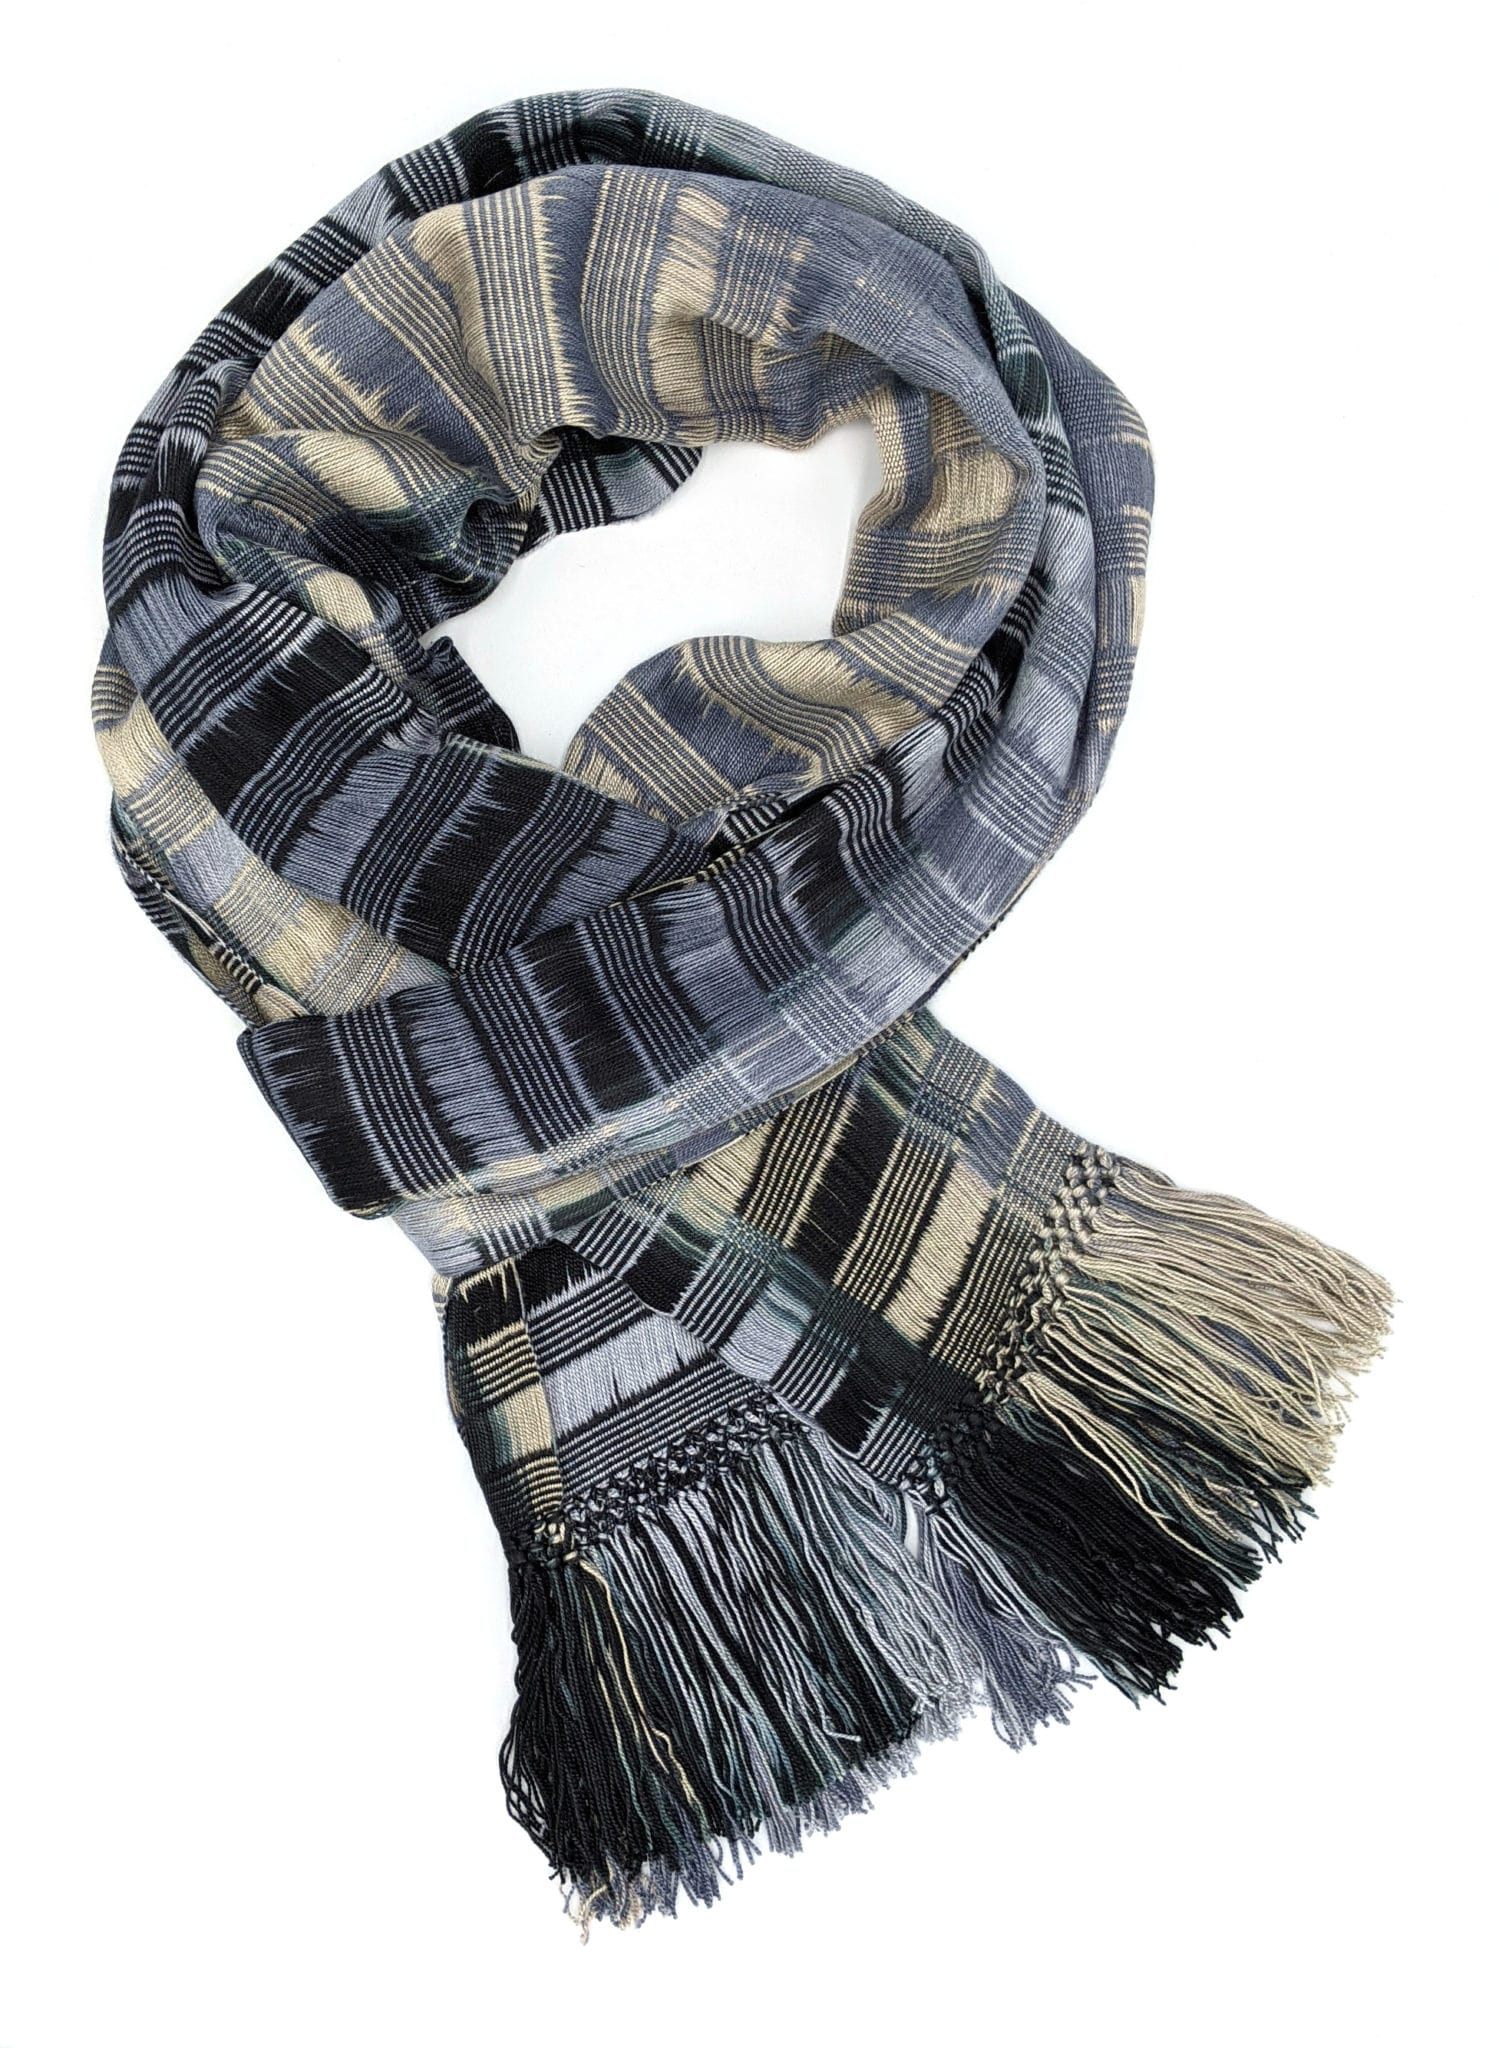 Black, Gray, Beige - Lightweight Bamboo Open-Weave Handwoven Scarf 8 x 68